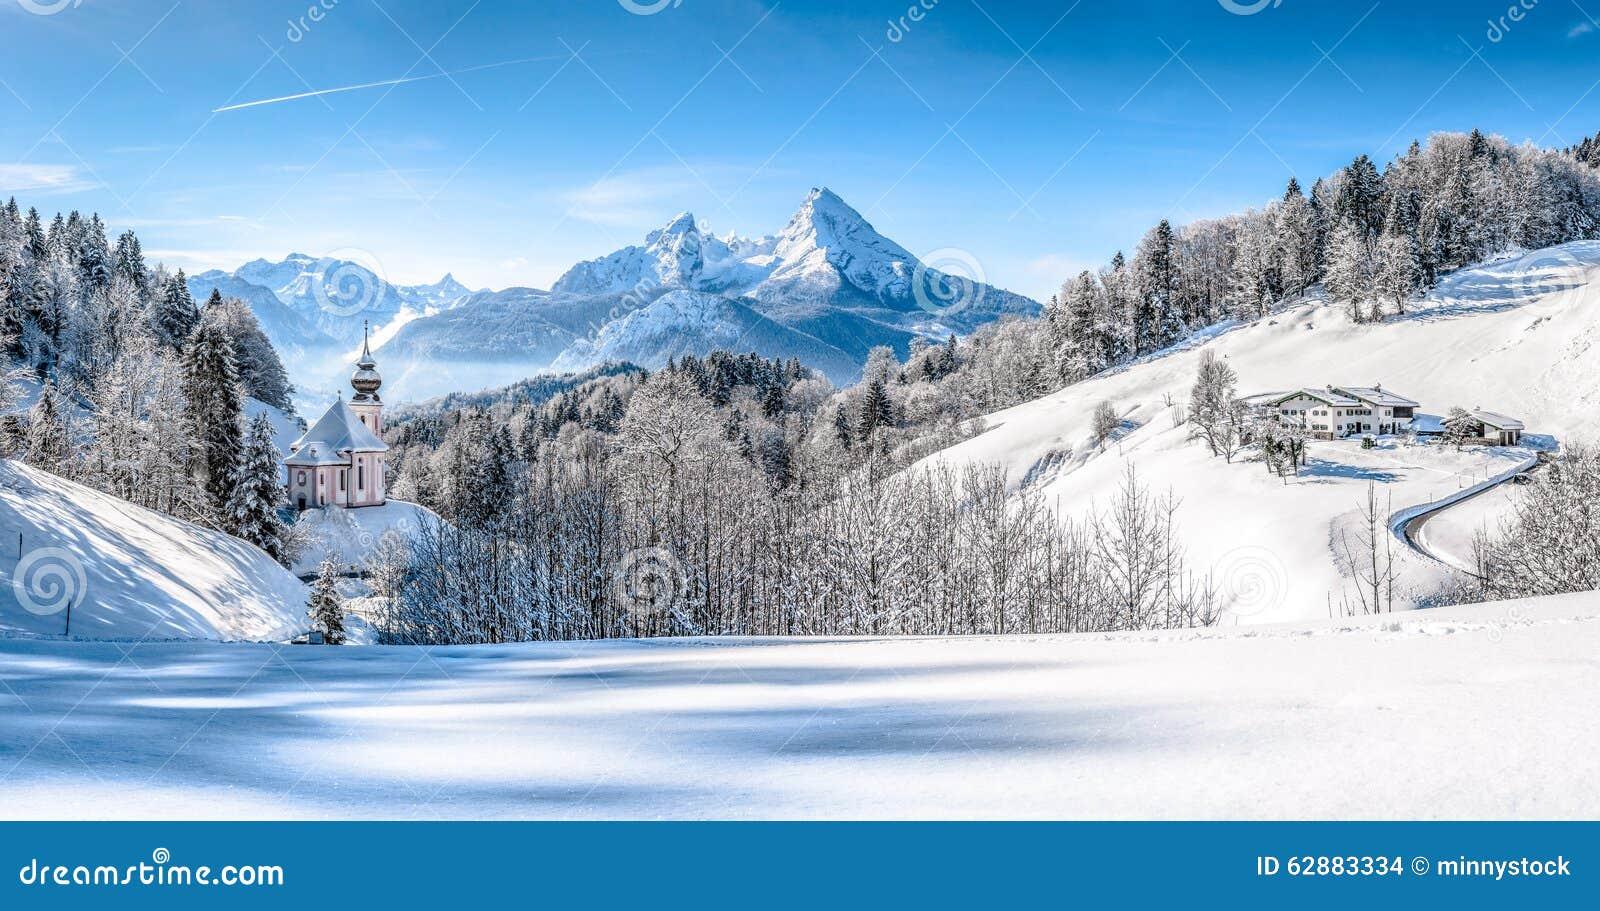 Christmas In Switzerland Vacation